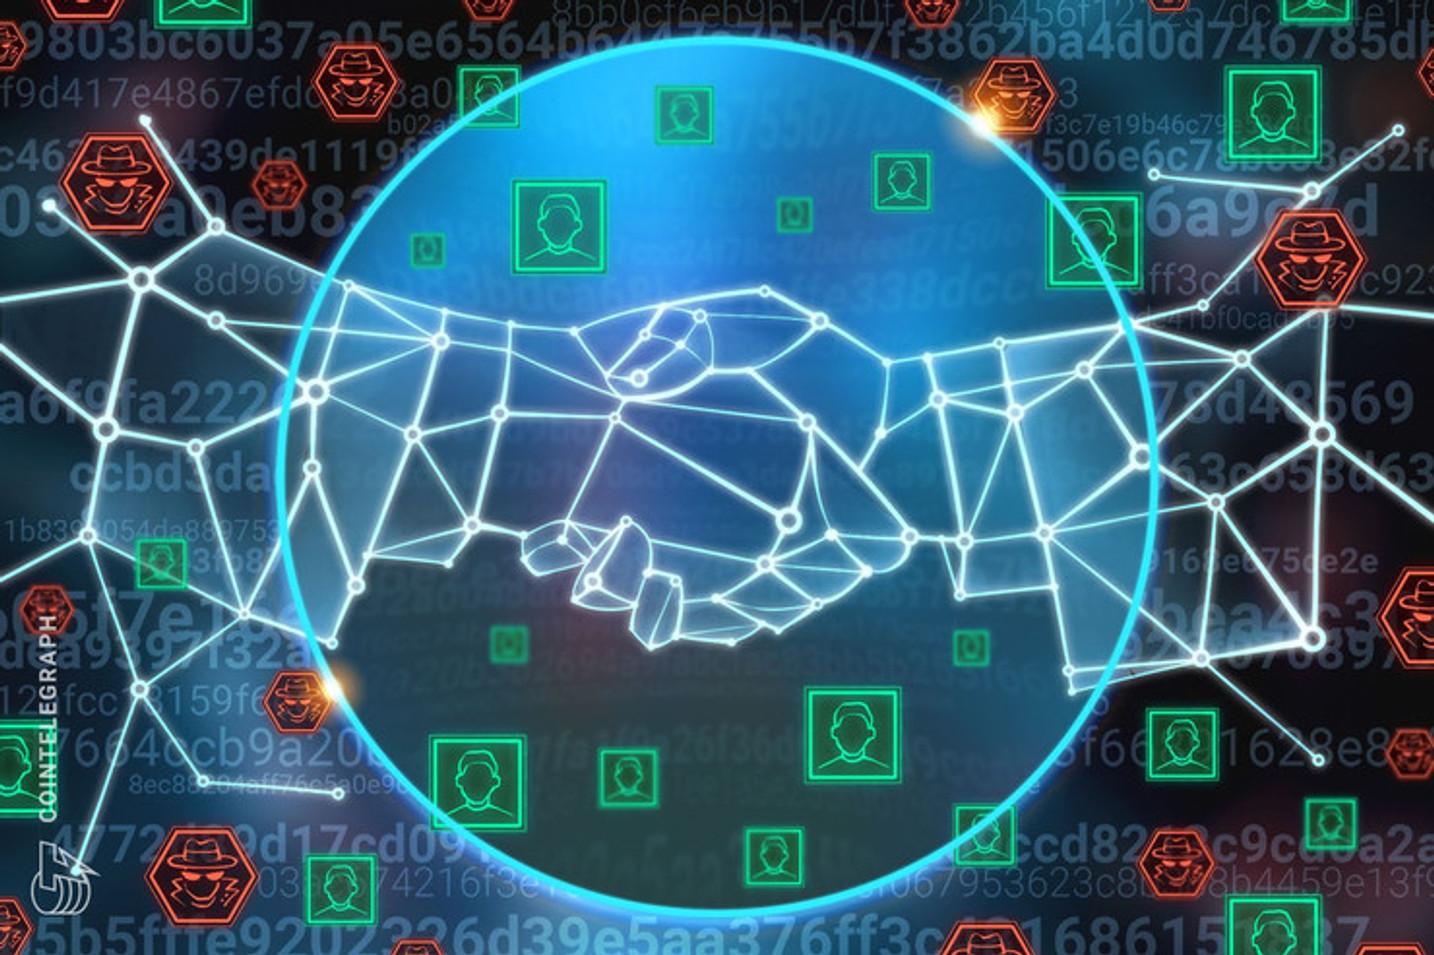 De olho no Open Banking, HSBC anuncia parceria com a Salesforce para conjunto de APIs